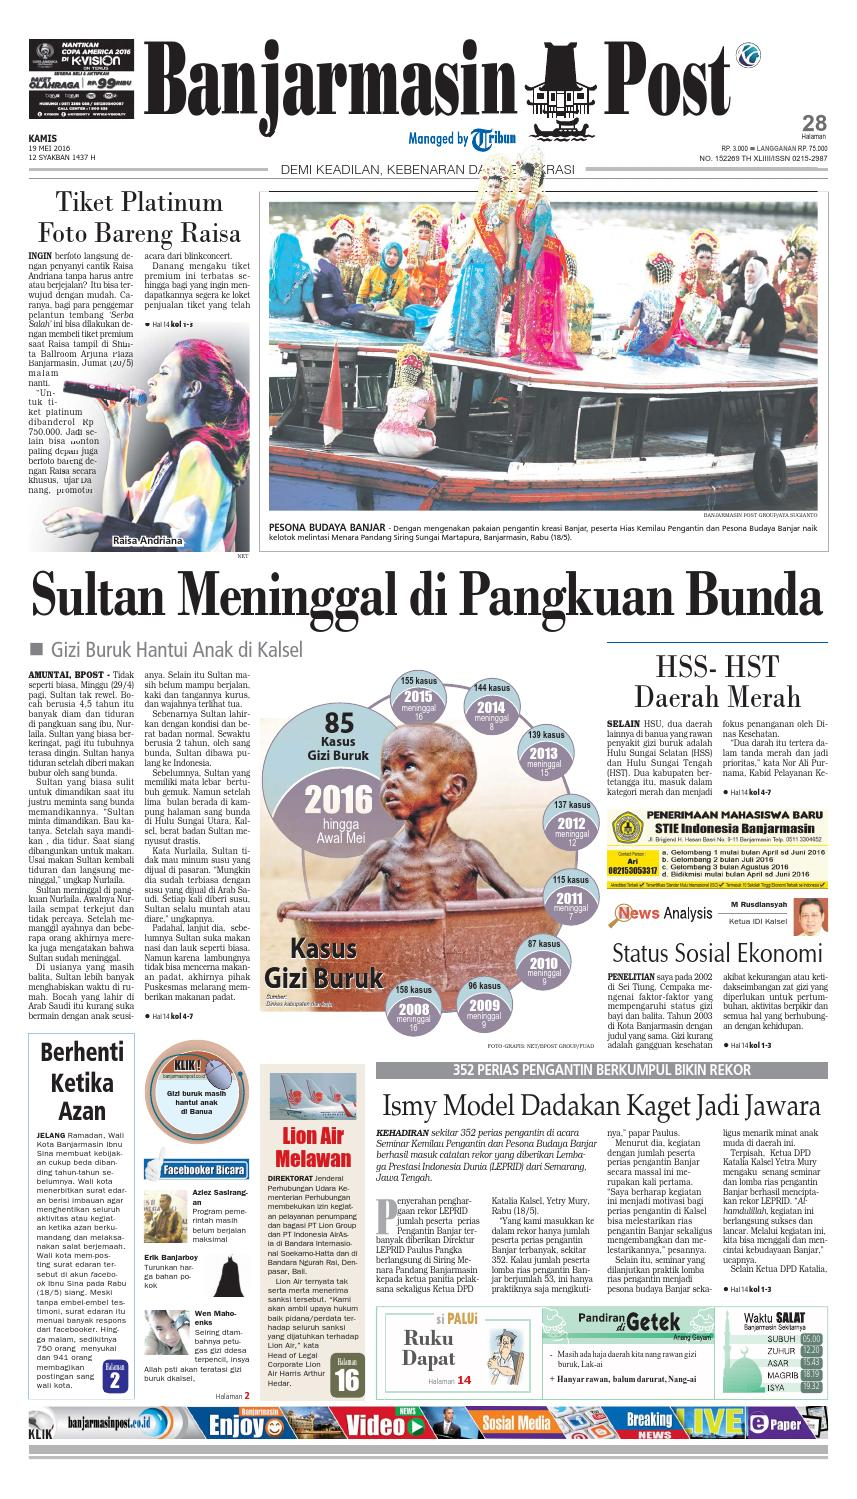 Banjarmasin Post Kamis 19 Mei 2016 By Issuu Produk Ukm Bumn Sastra Organdi Biru